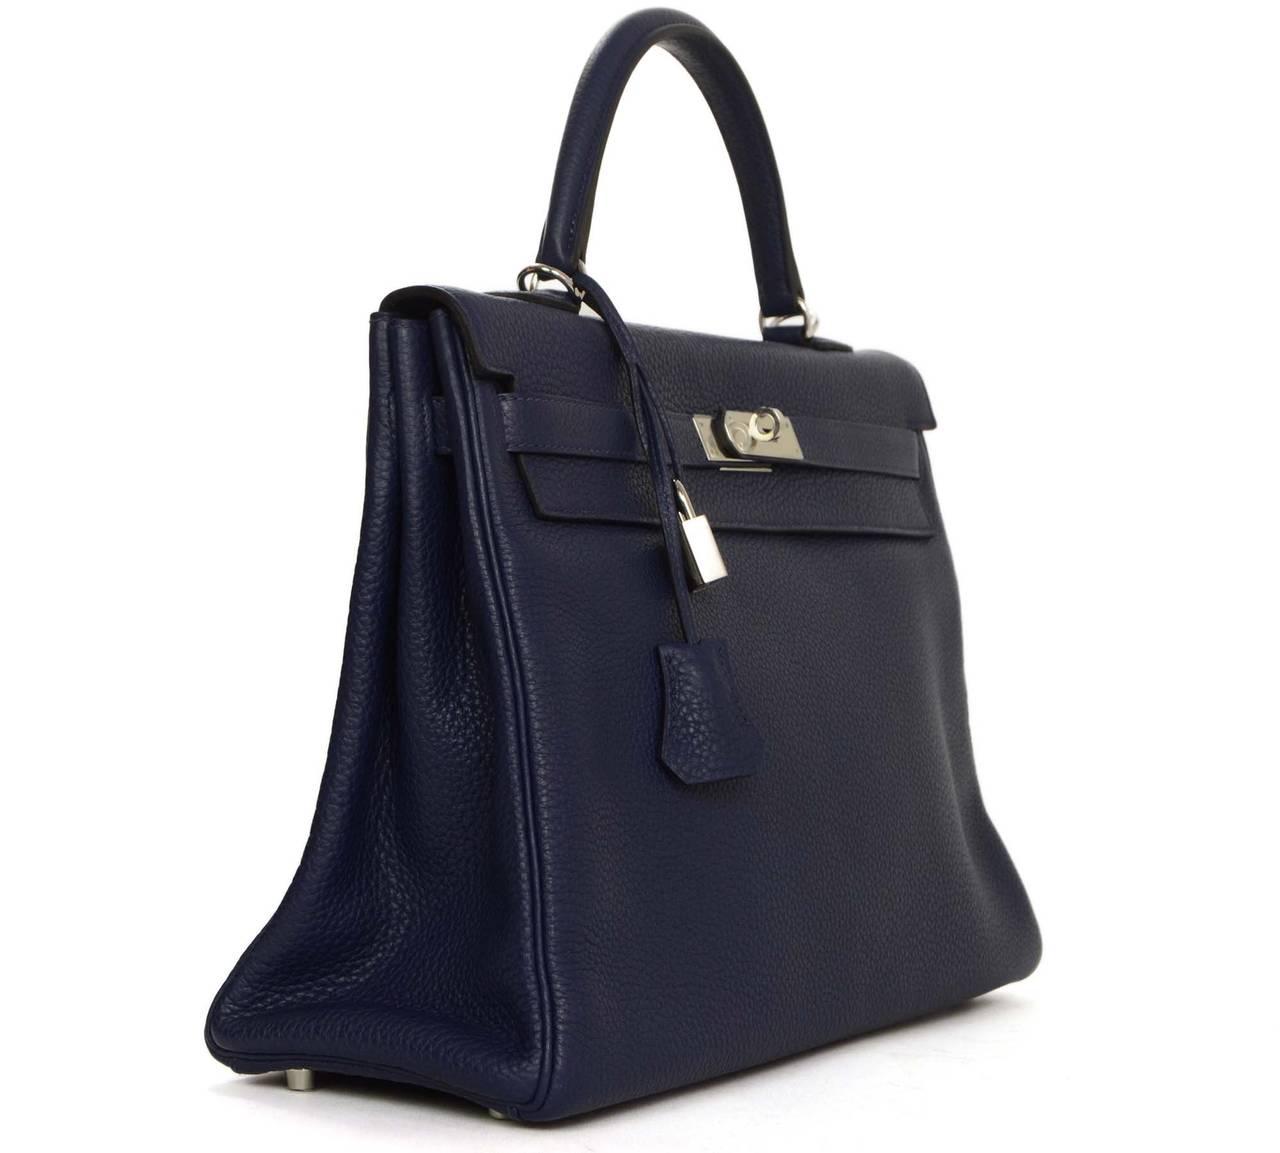 hermes new navy bleu saphir clemence leather 35cm kelly bag phw